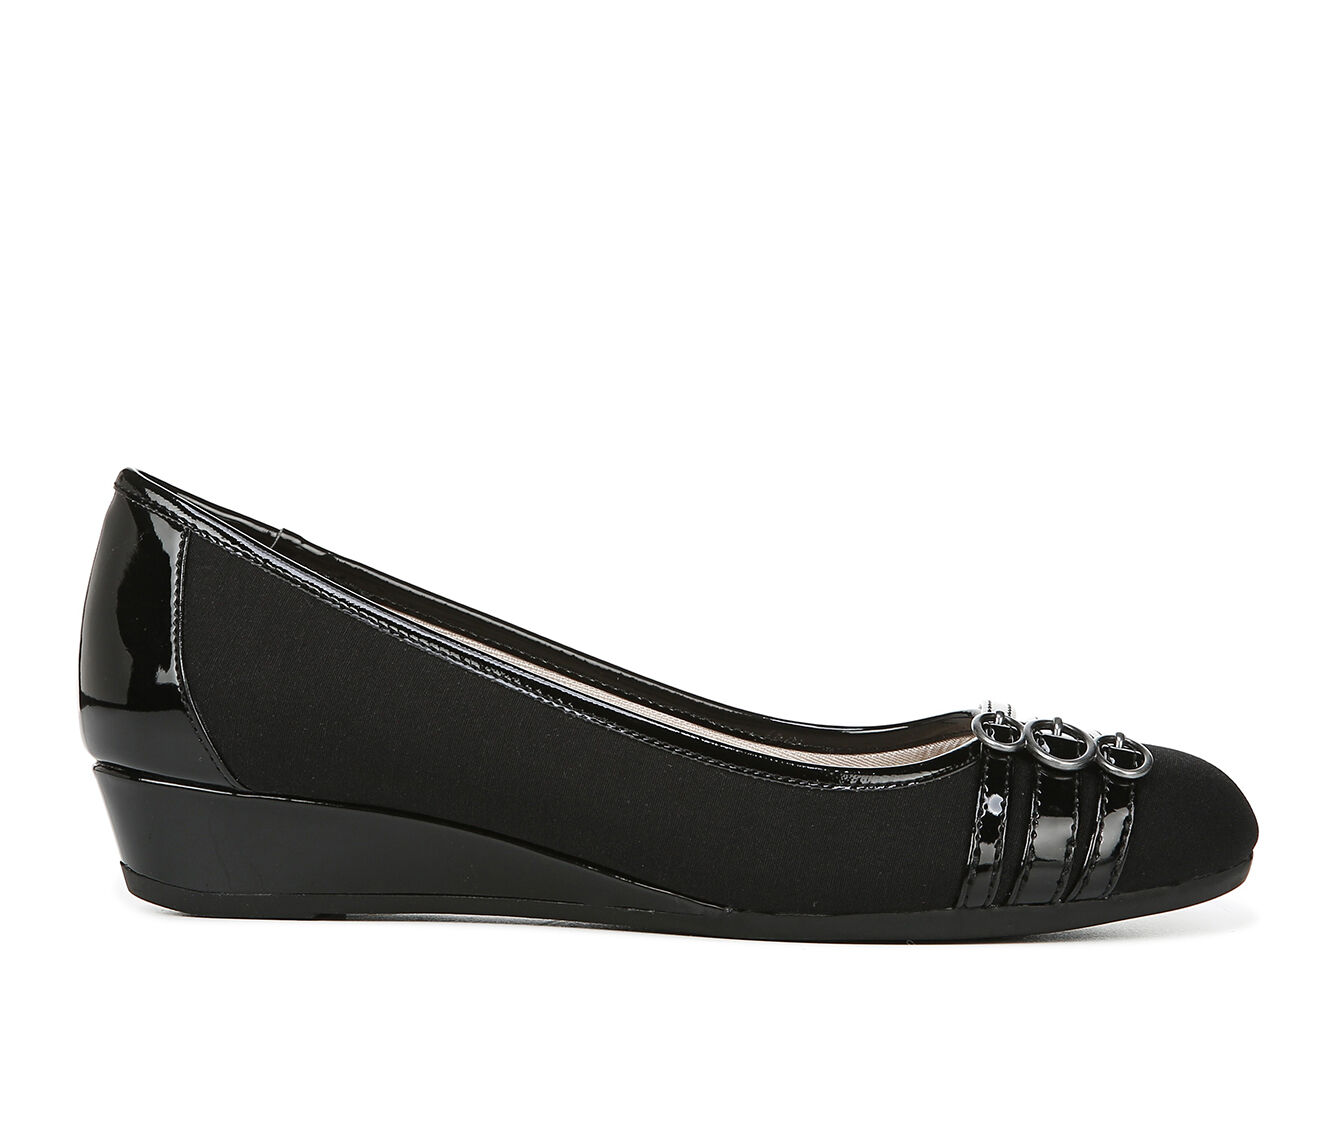 Women's LifeStride Fawn Shoes Black Fabric